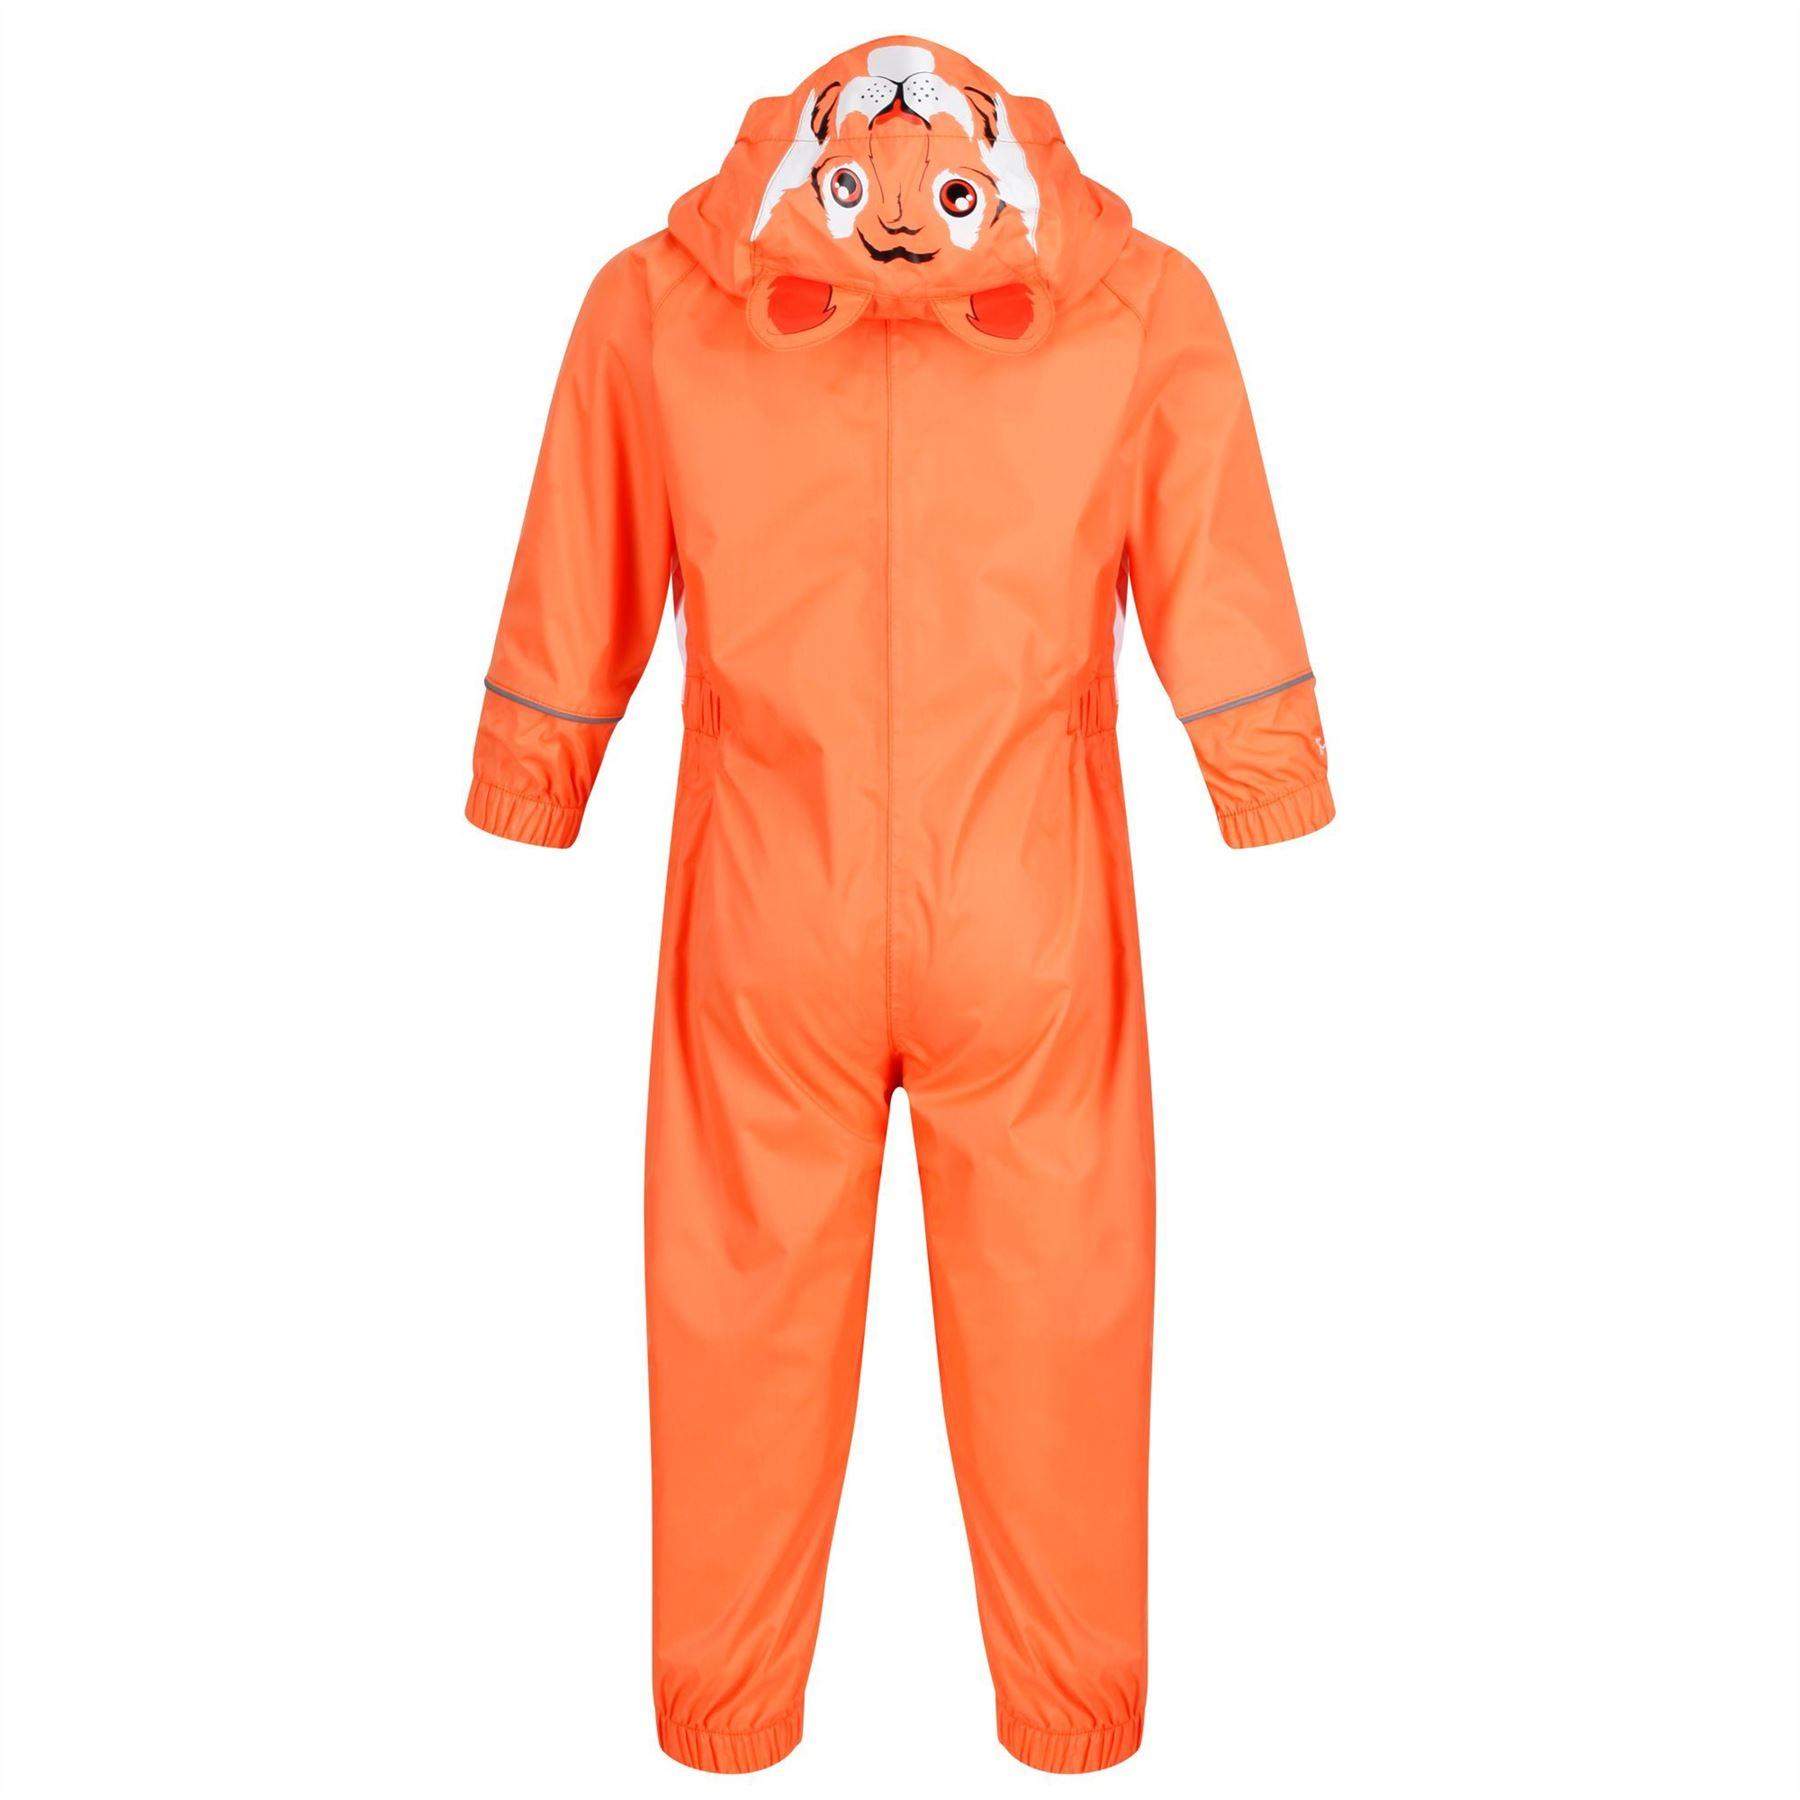 miniatuur 7 - Regatta Kids Charco All in Onezee Waterproof Puddle Suit Animal style Boys Girls